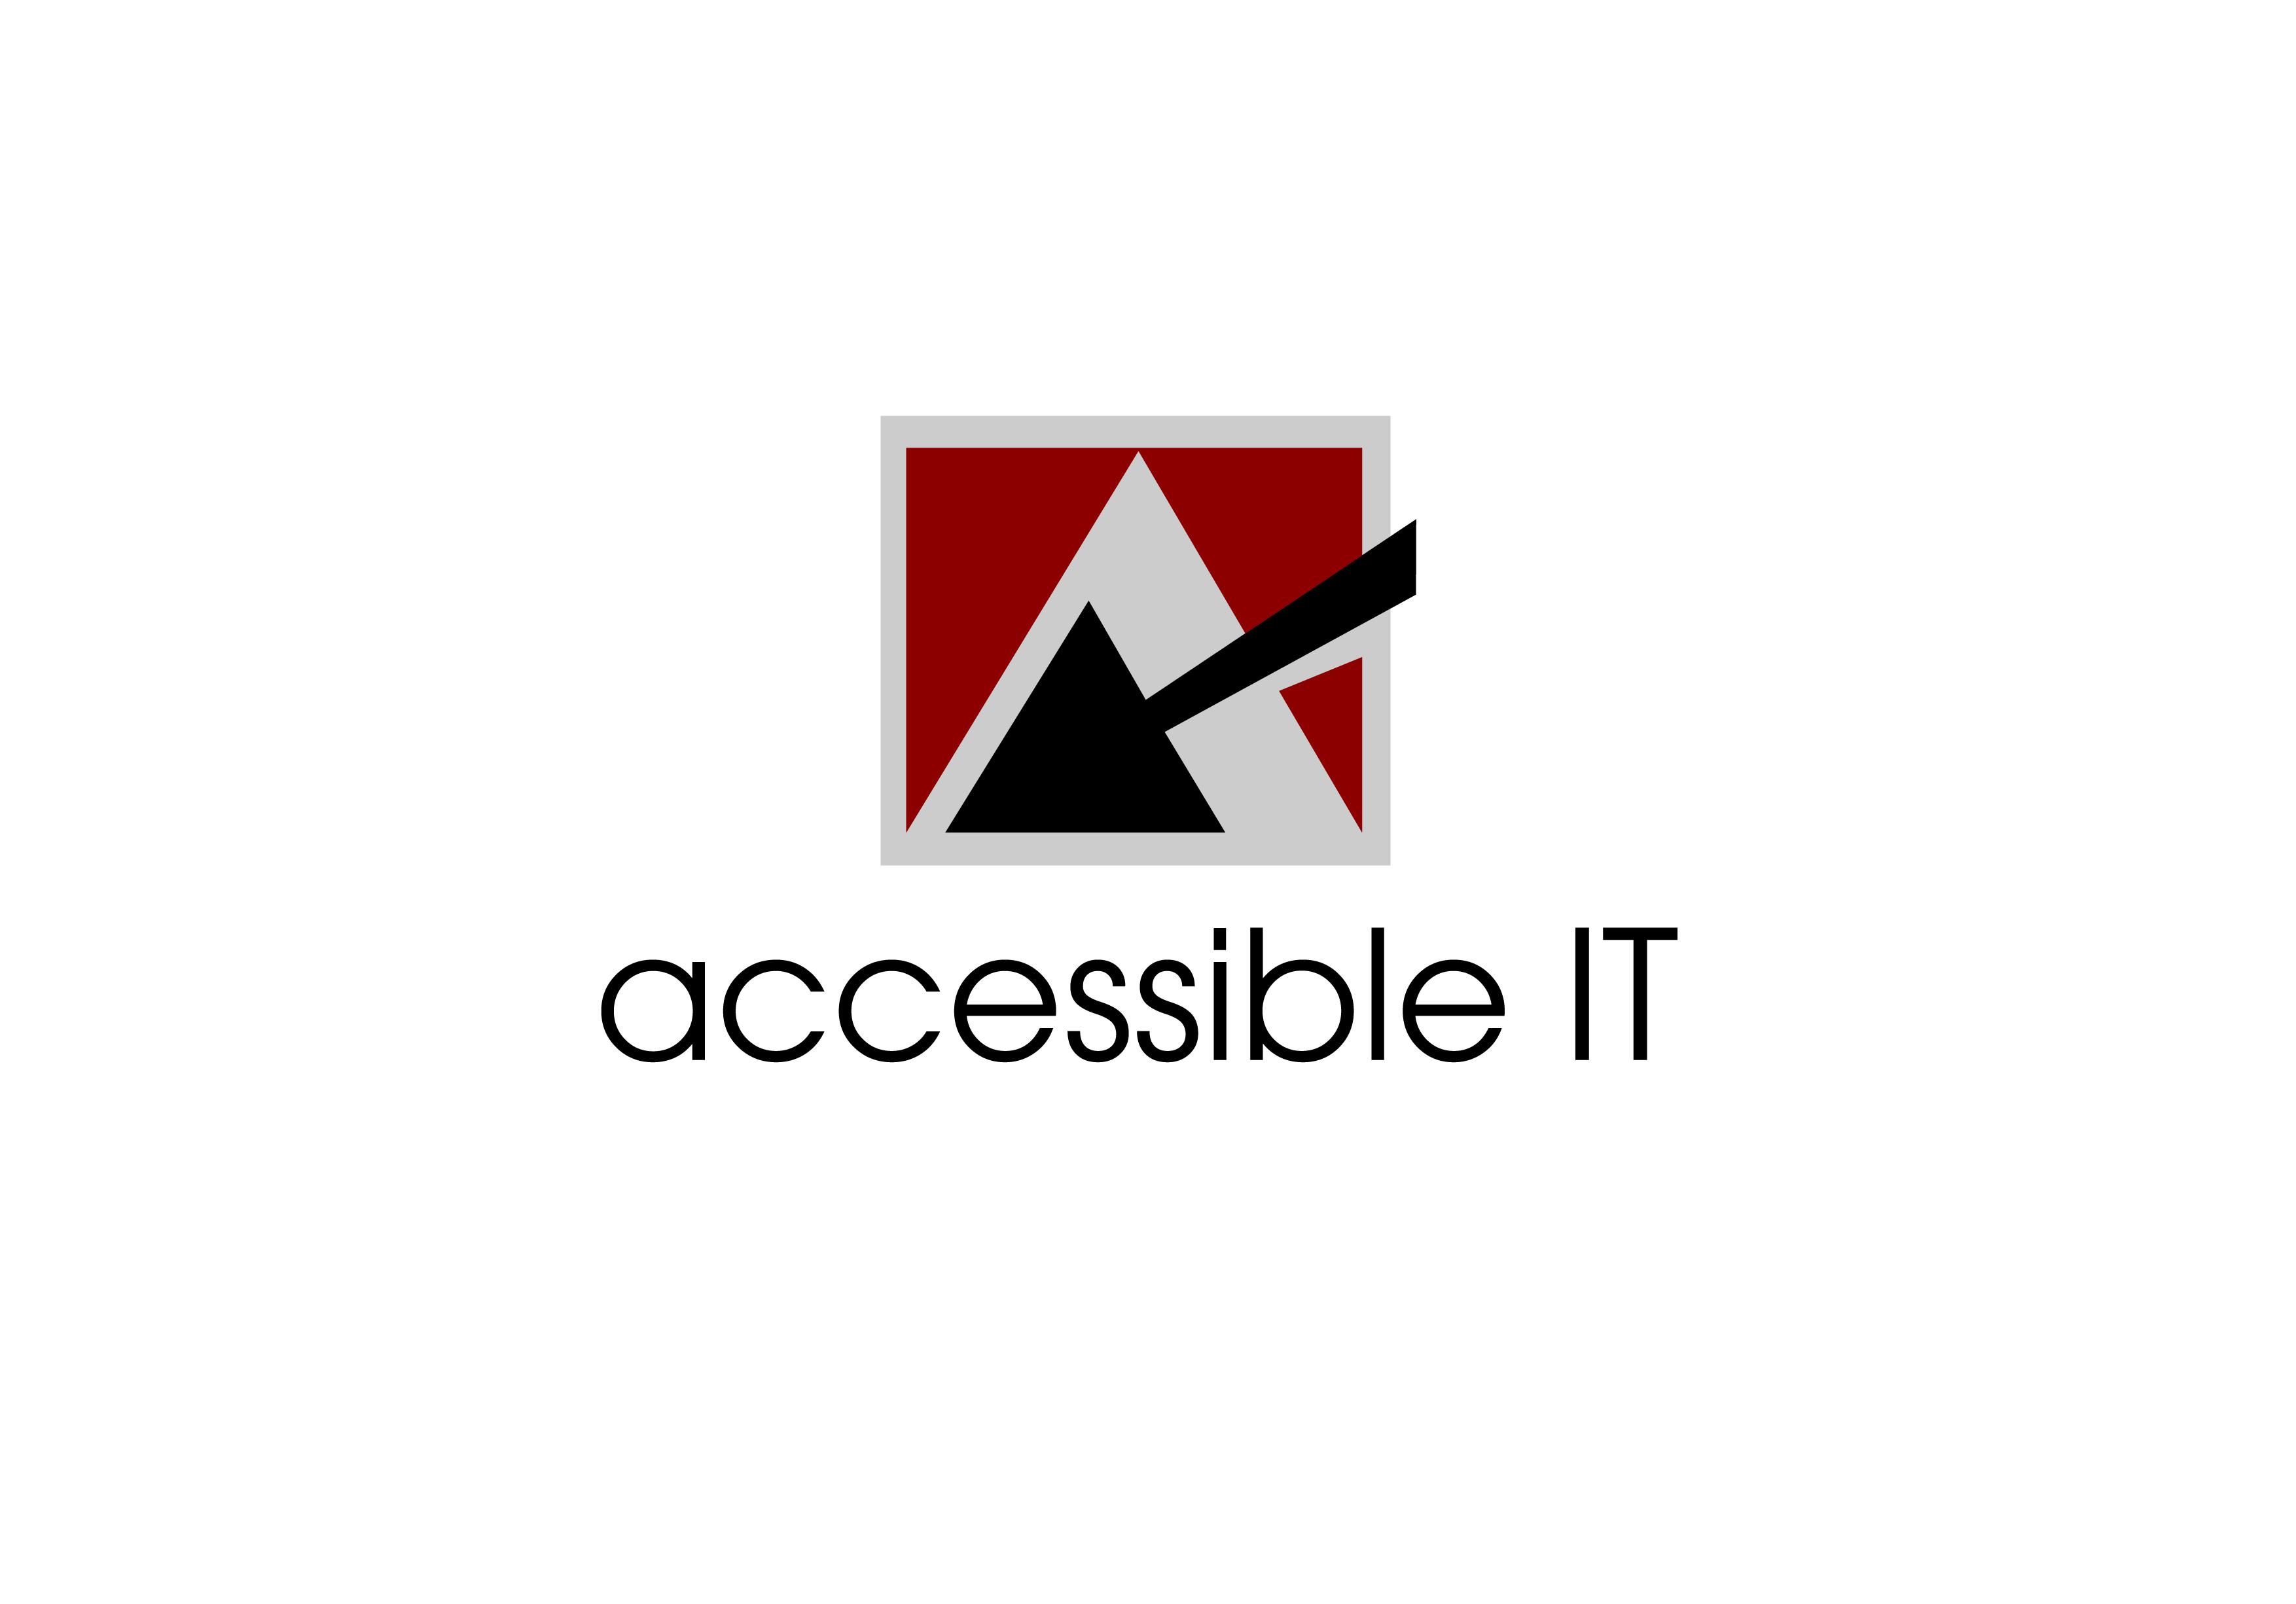 Logo Design by Wilfredo Mendoza - Entry No. 63 in the Logo Design Contest Logo Design Needed for Exciting New Company Accessible IT.